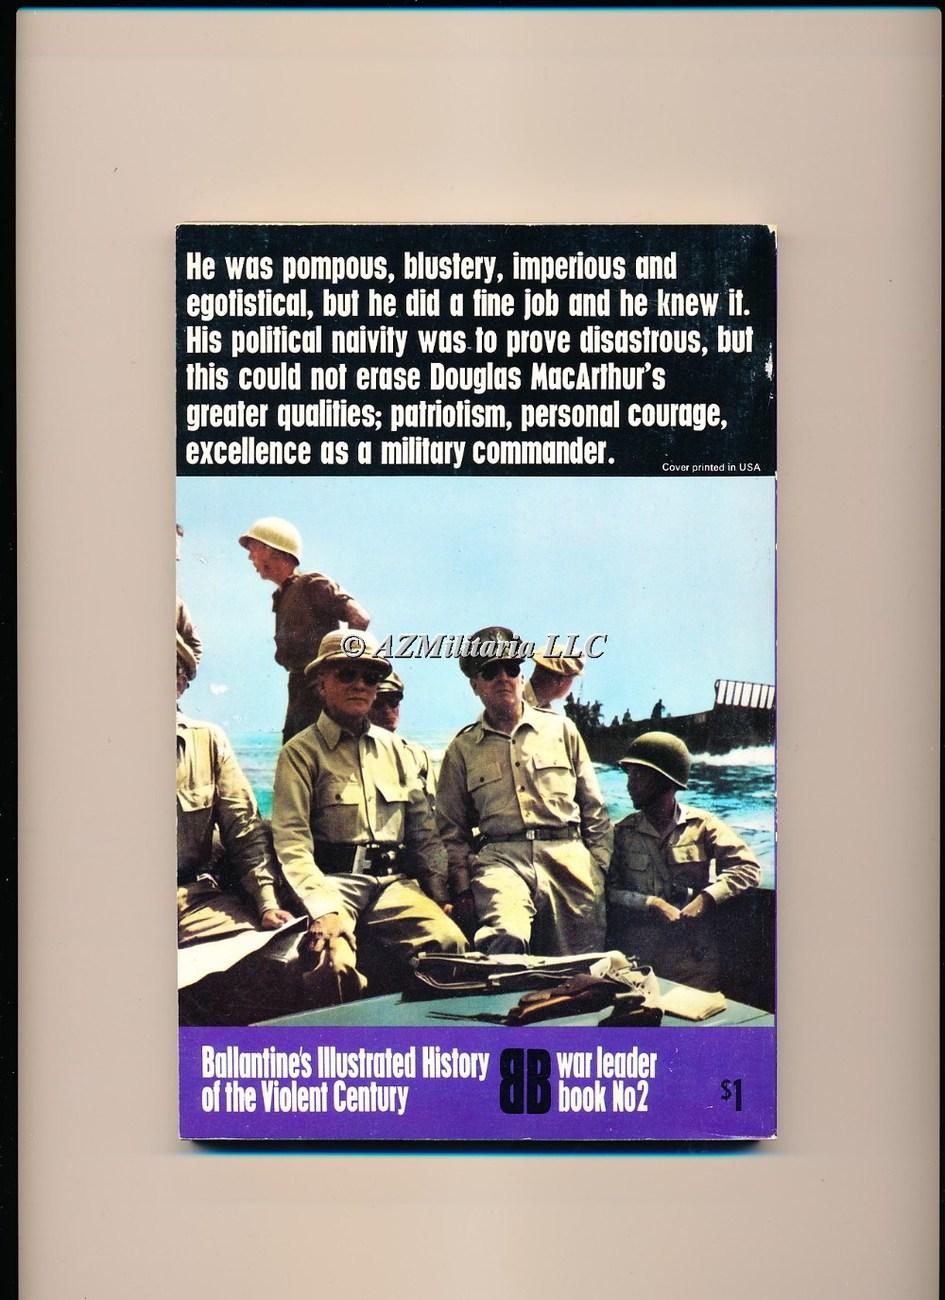 MacArthur (War Leader Book No 2)